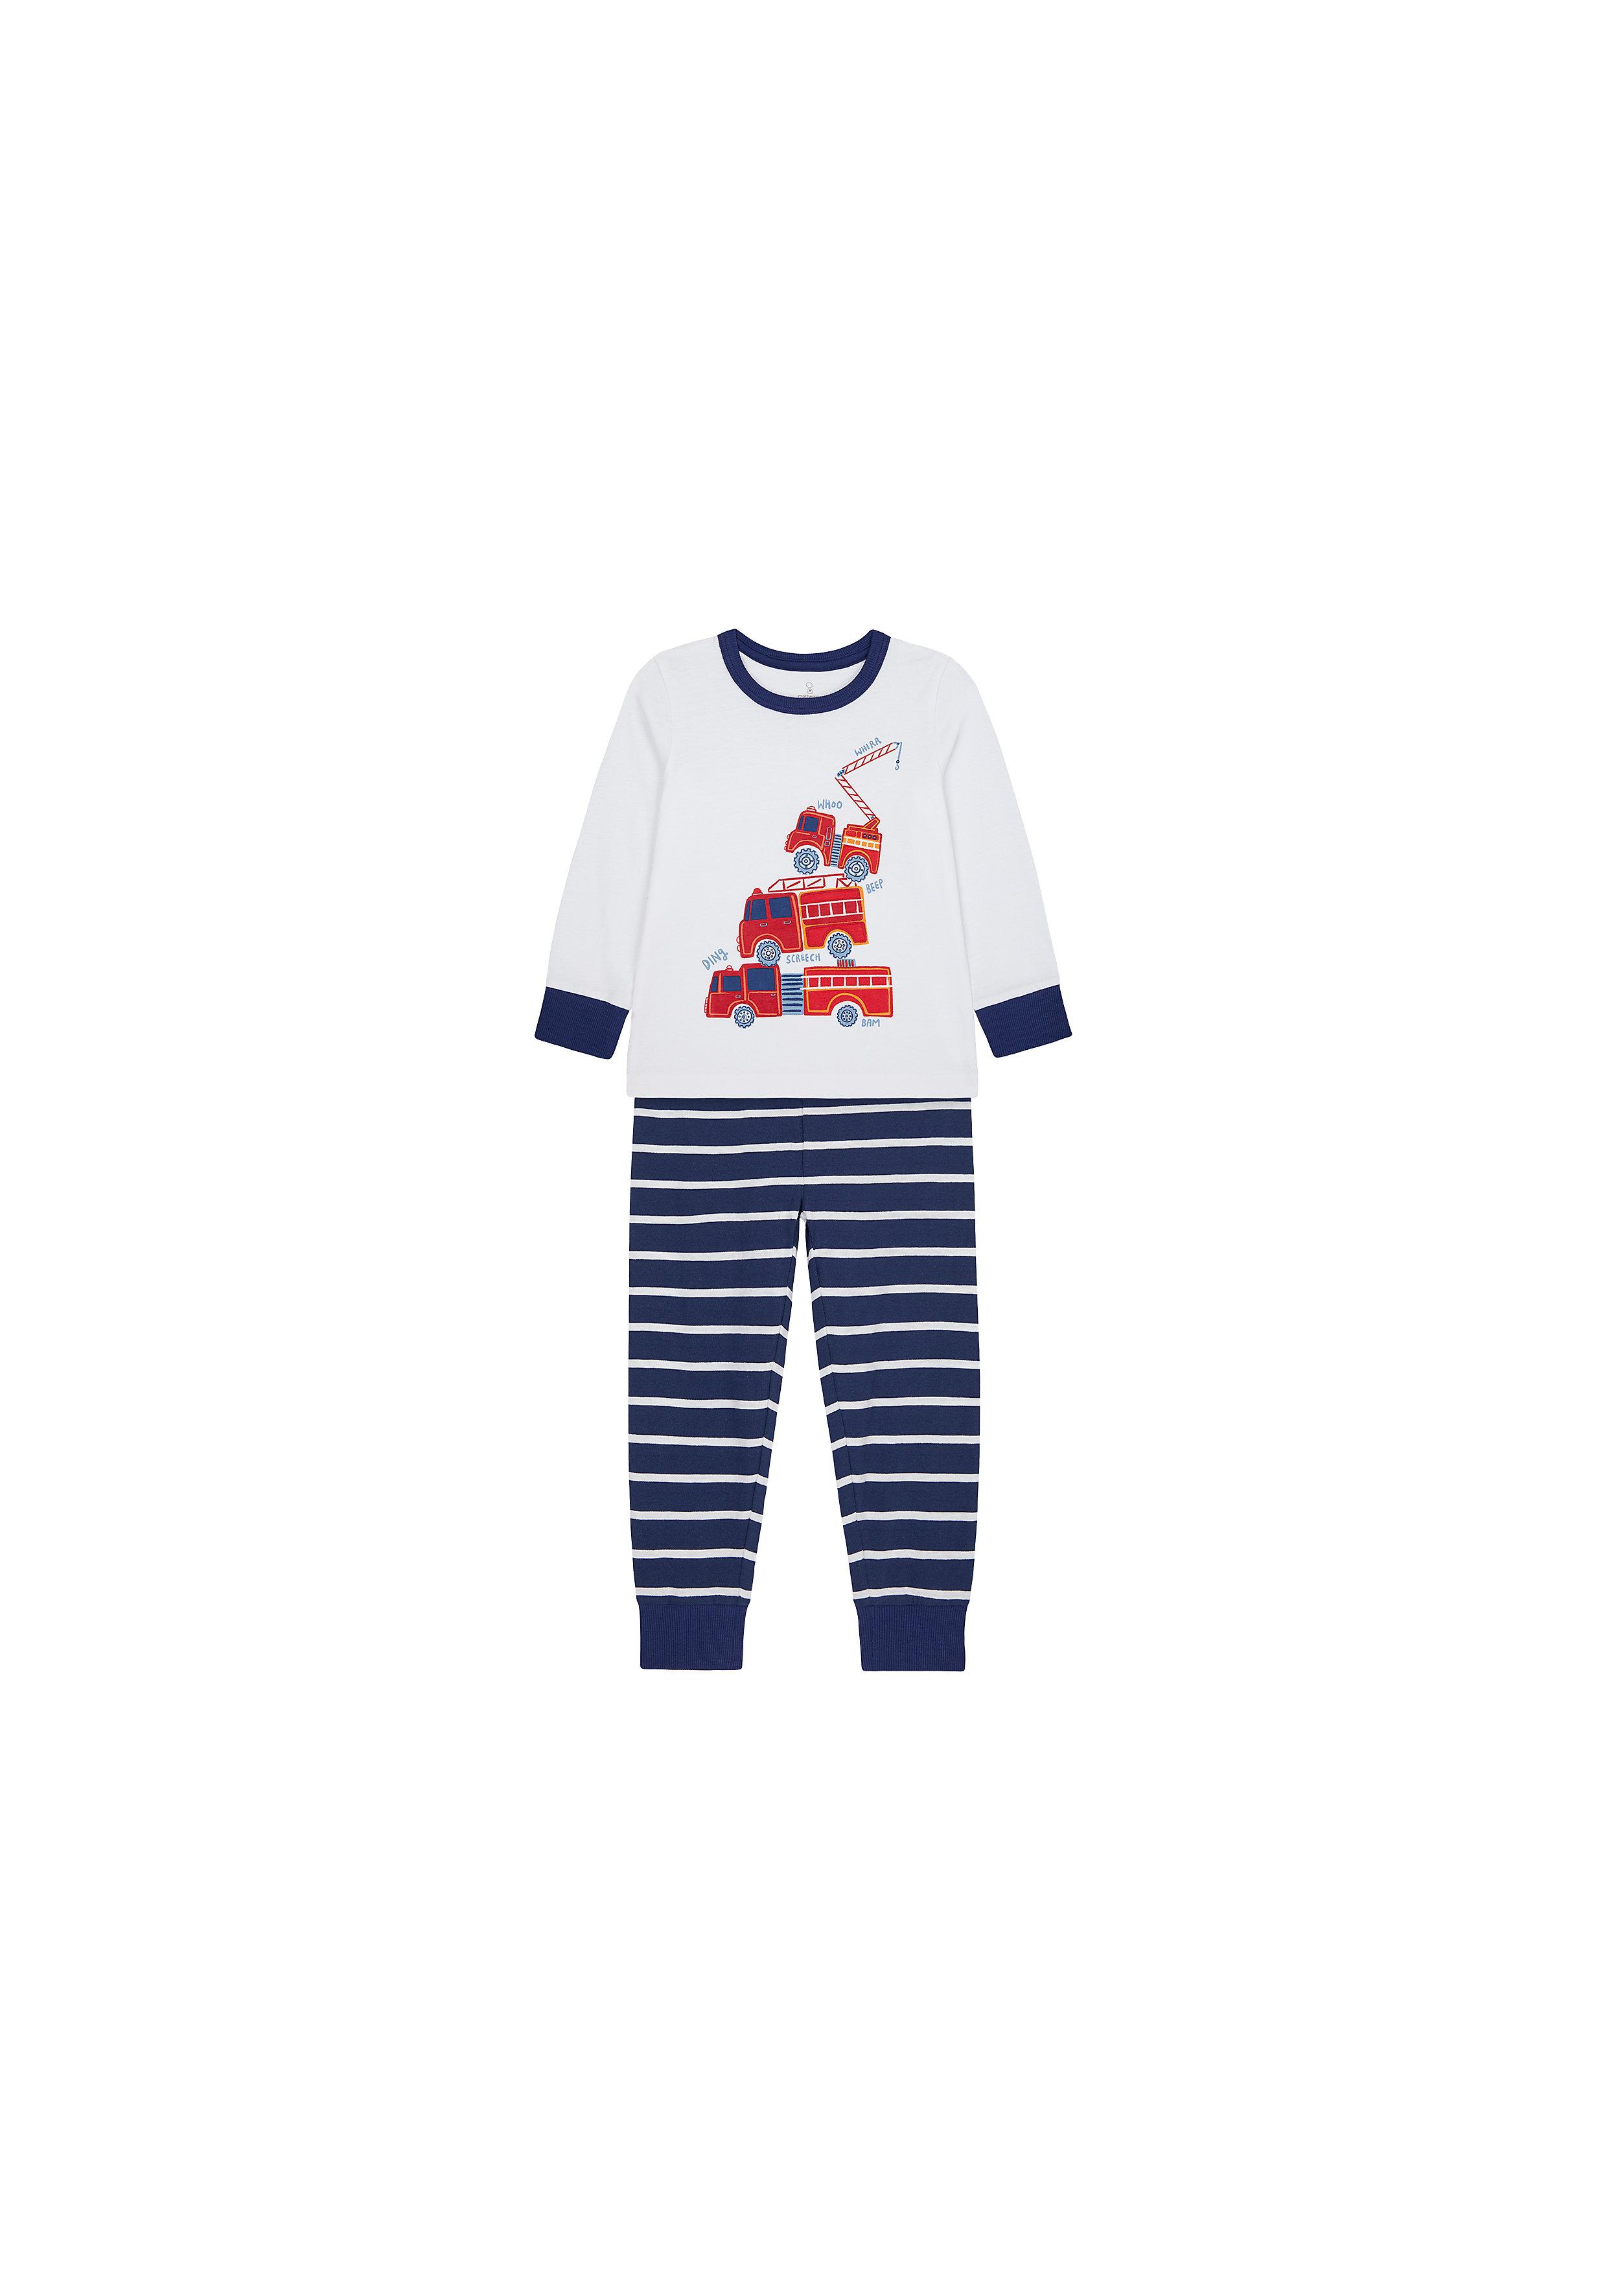 Mothercare   Boys Full Sleeves Pyjama Set Fire Engine Print - White Navy